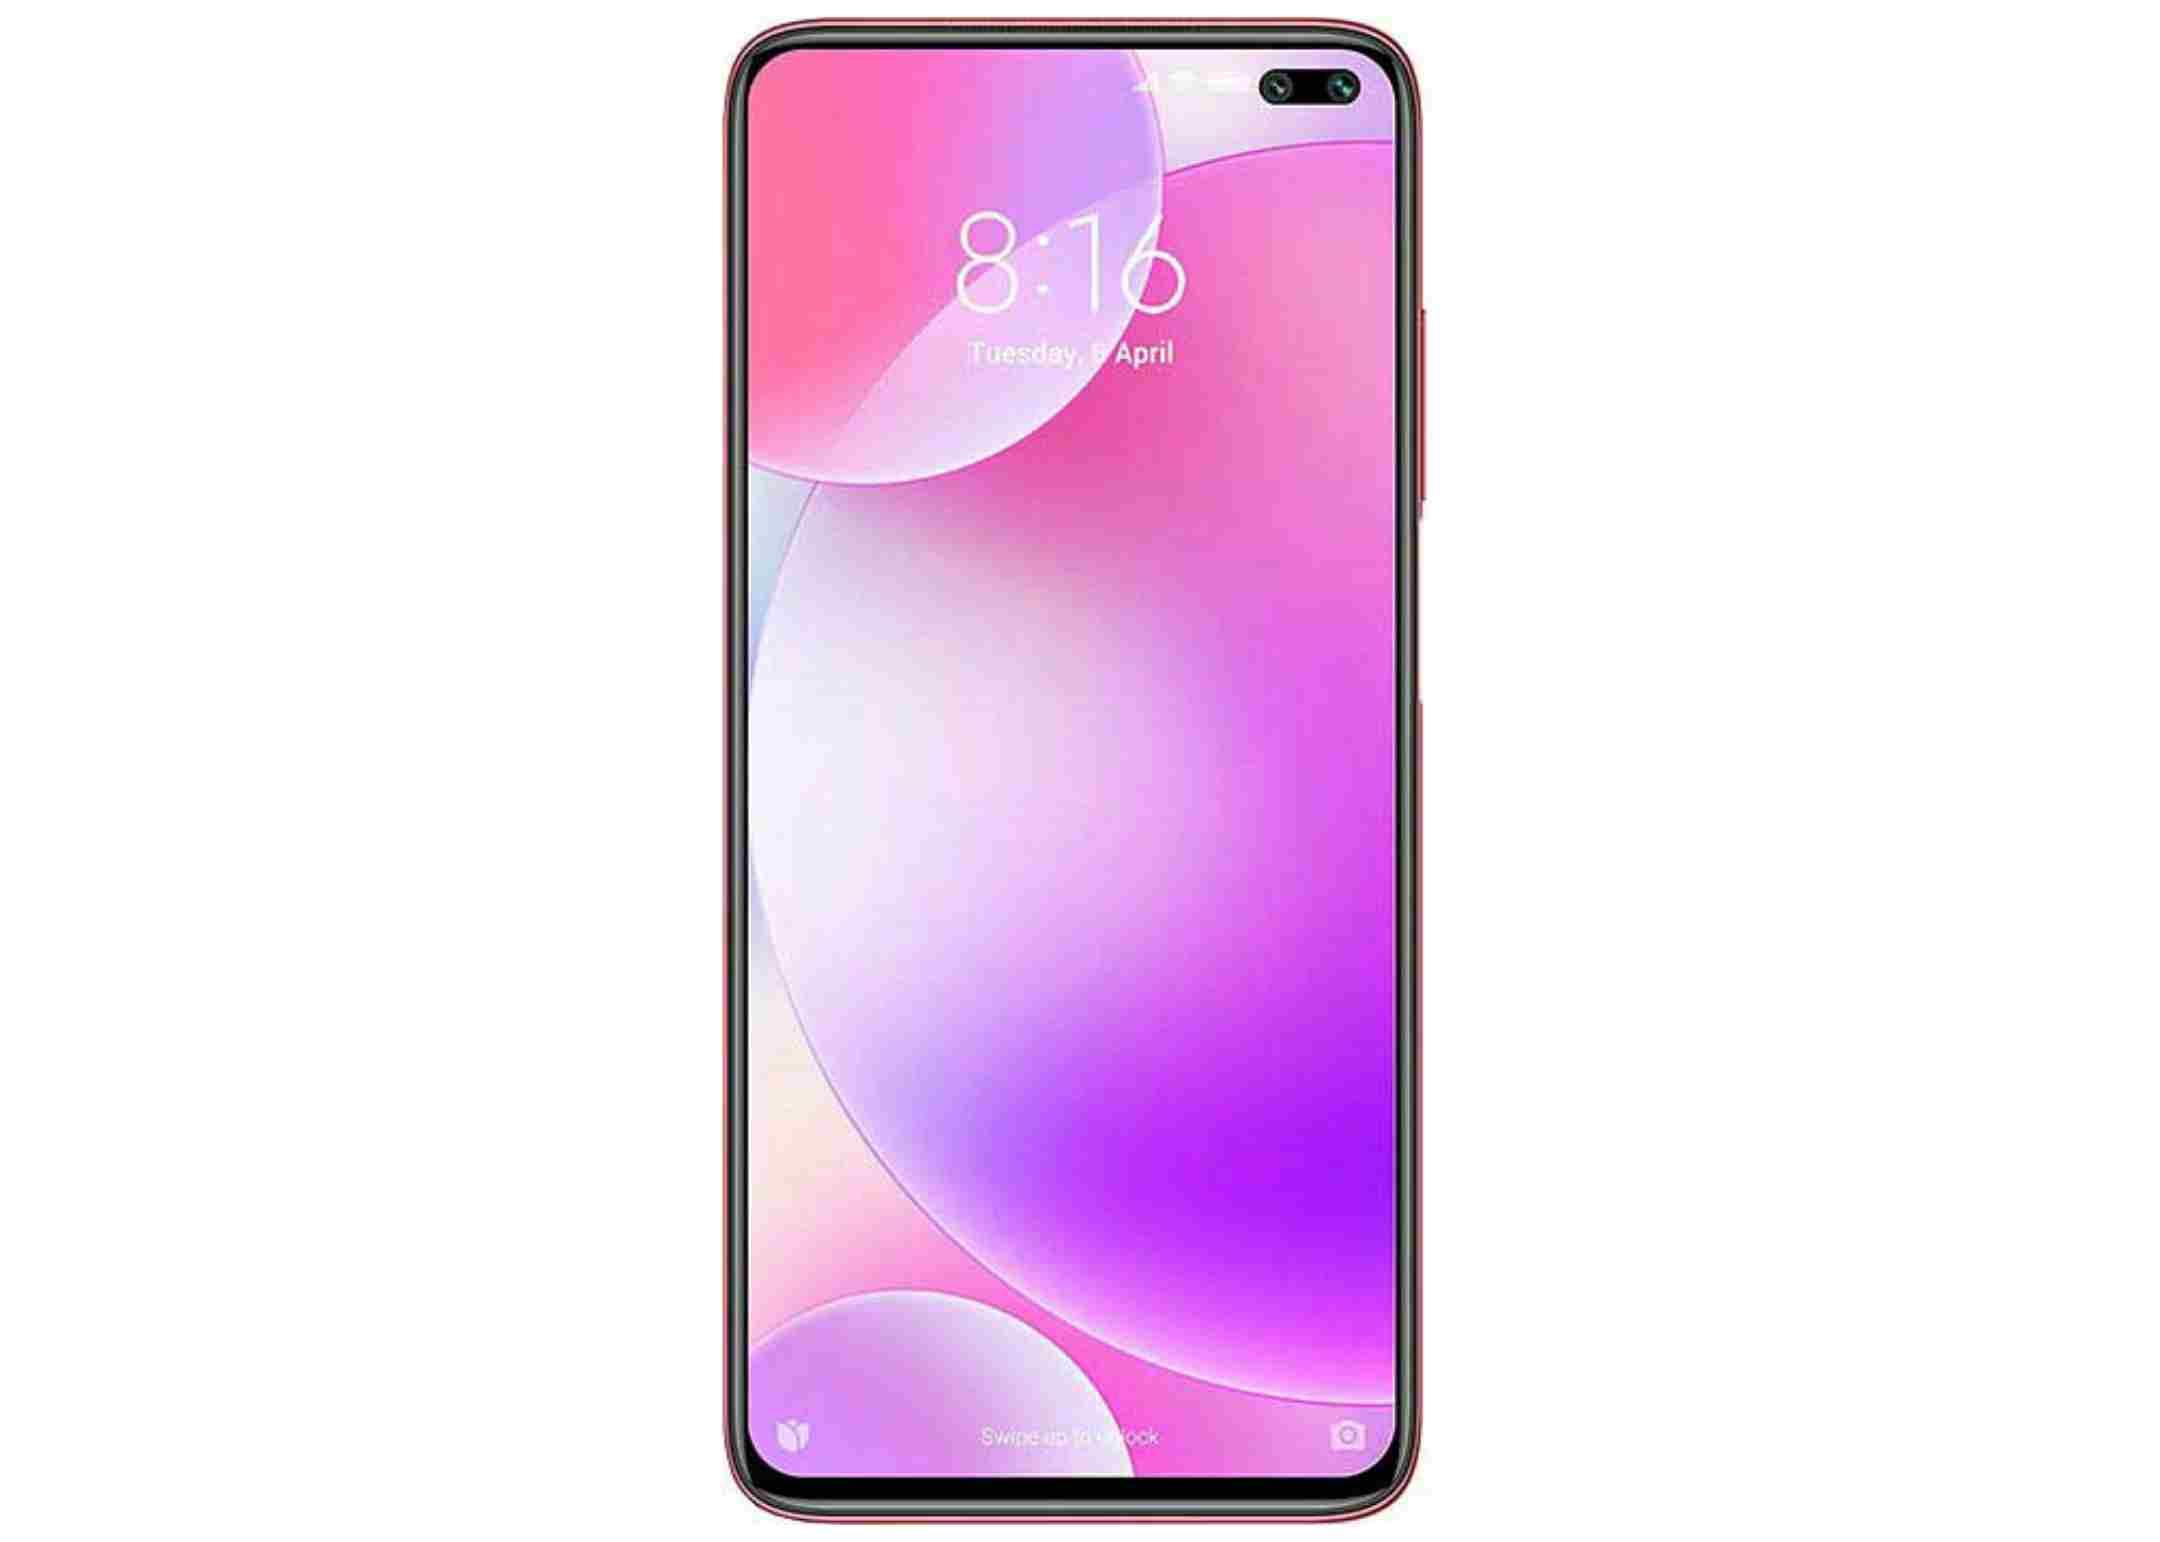 Poco X2 Lite Expected Price, Release Date & Specs - My Mobiles